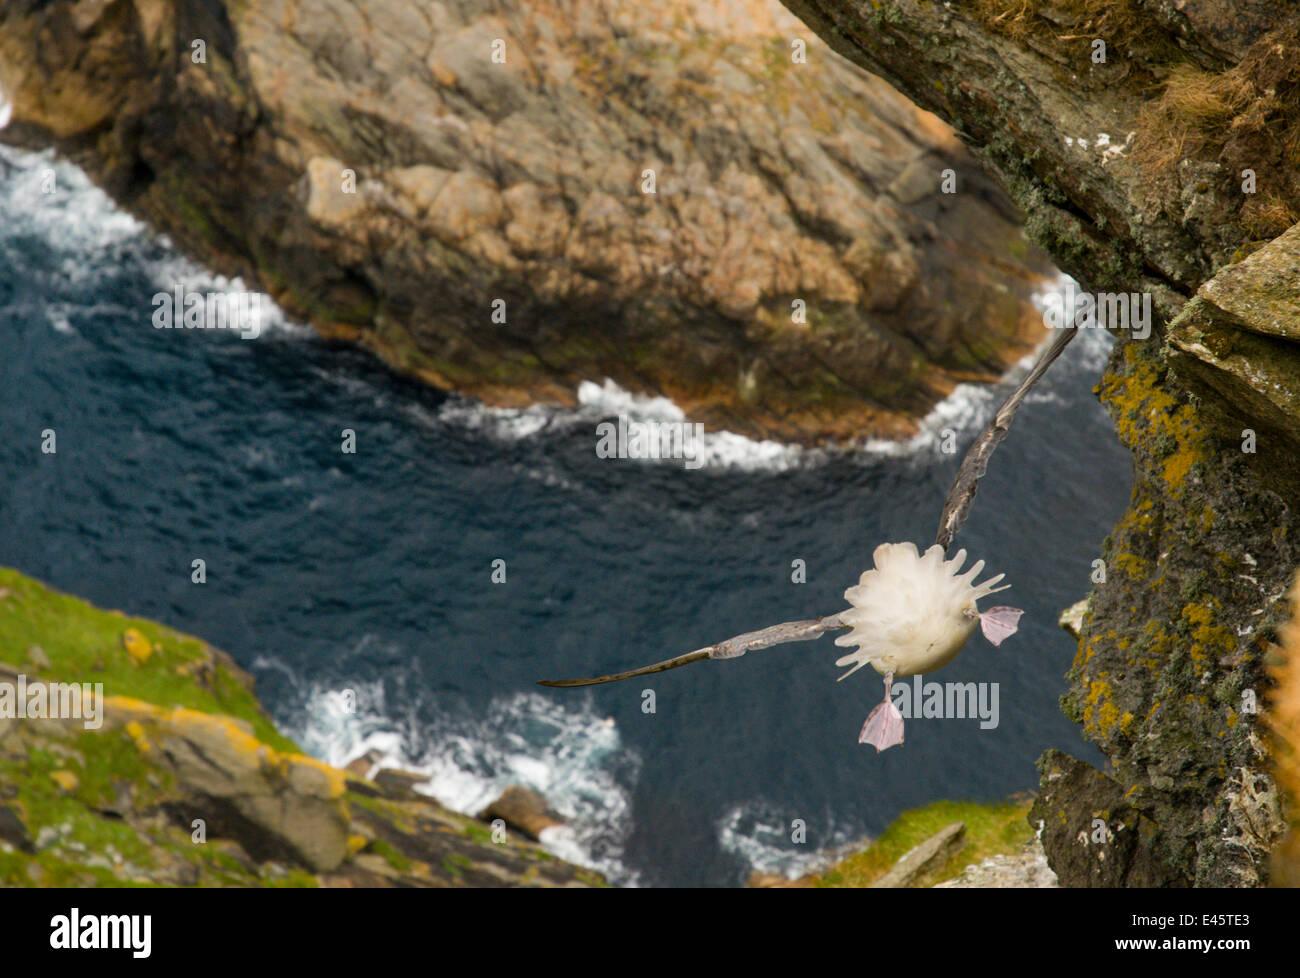 Fulmar (Fulmarus glacialis) rear view of bird hanging in air over steep cliffs, Shetland Islands, Scotland, UK. - Stock Image